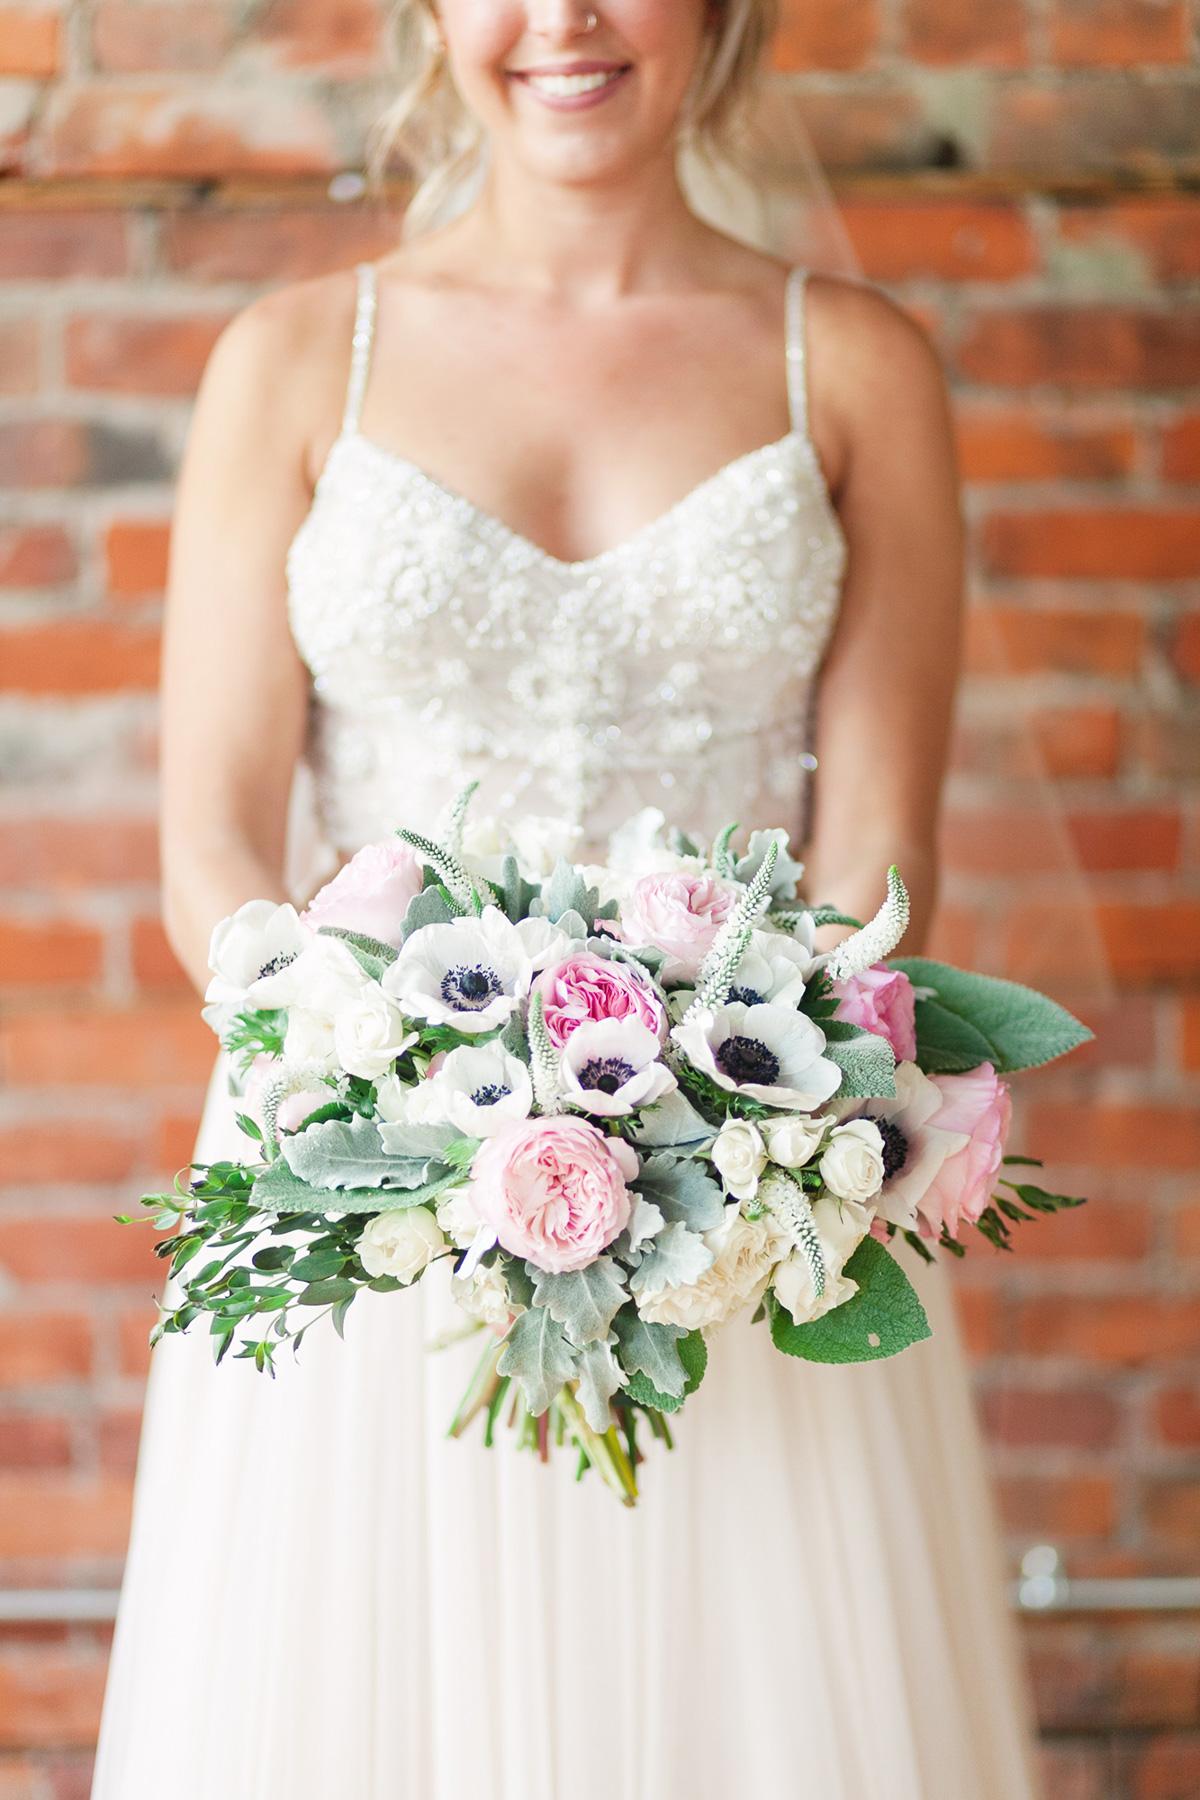 jennifer-xu-photography-vineyard-bride-swish-list-spice-factory-hamilton-wedding-21.jpg